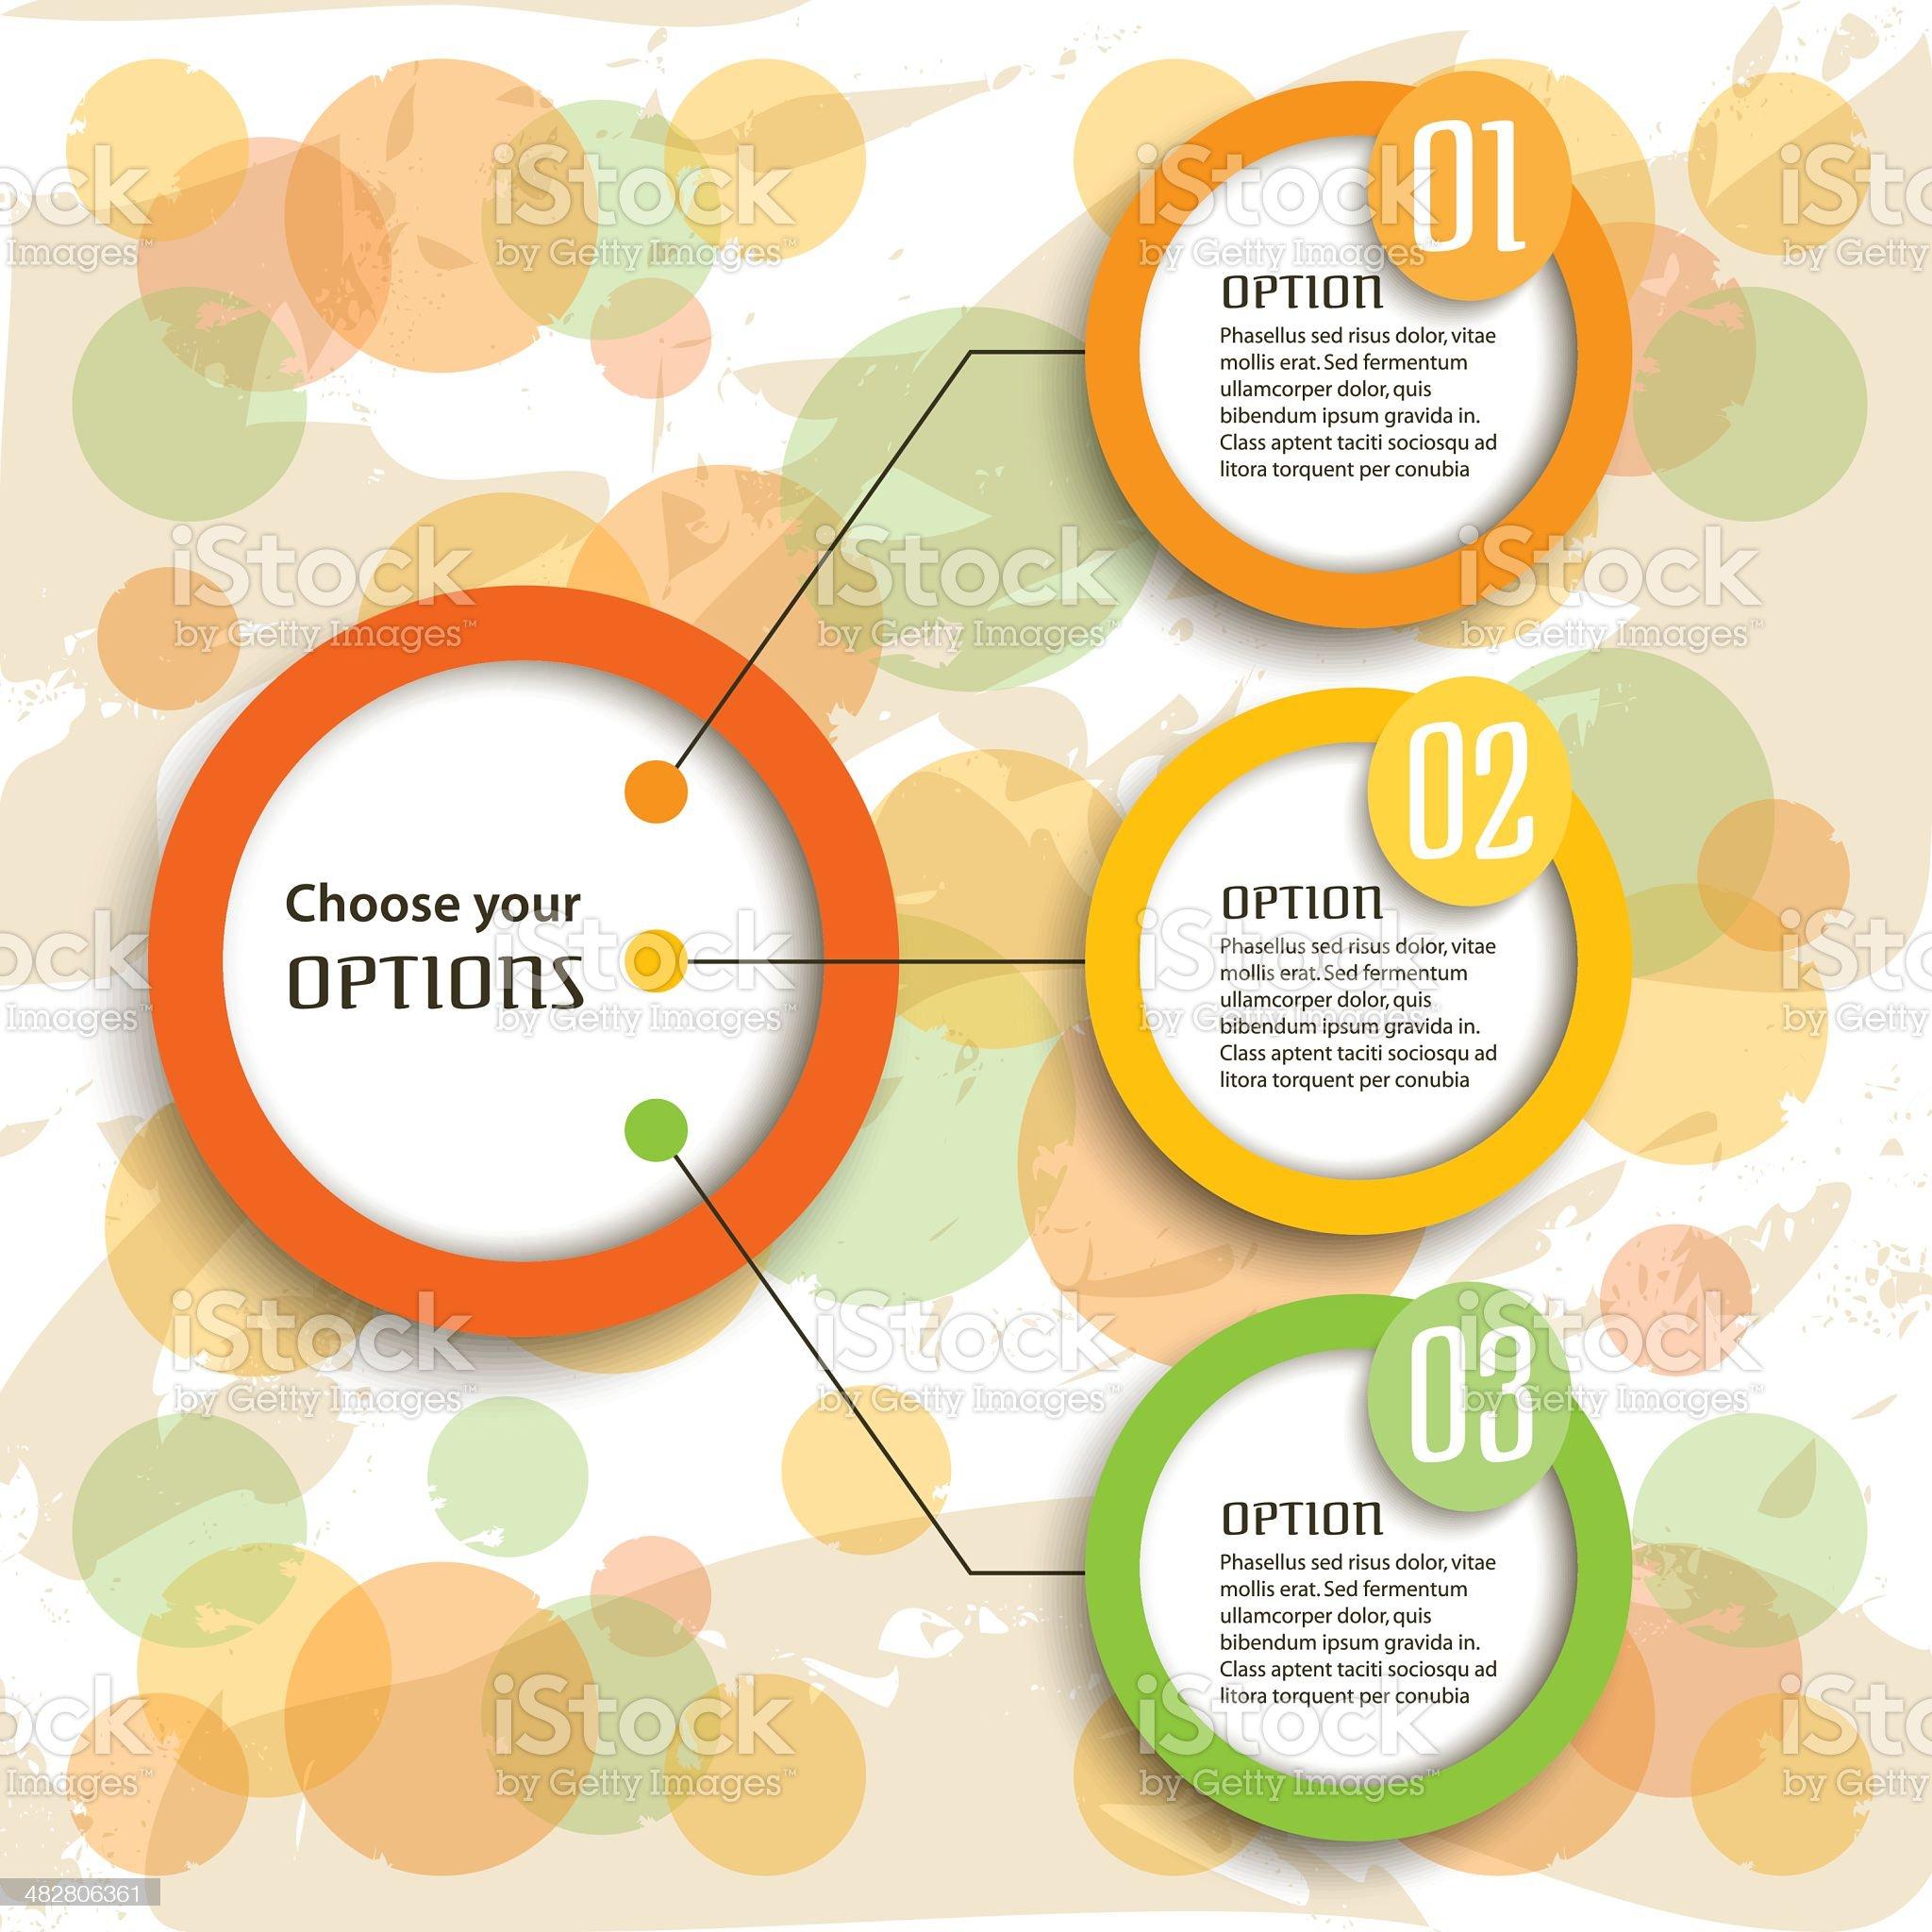 Retro Infographic Options royalty-free stock vector art